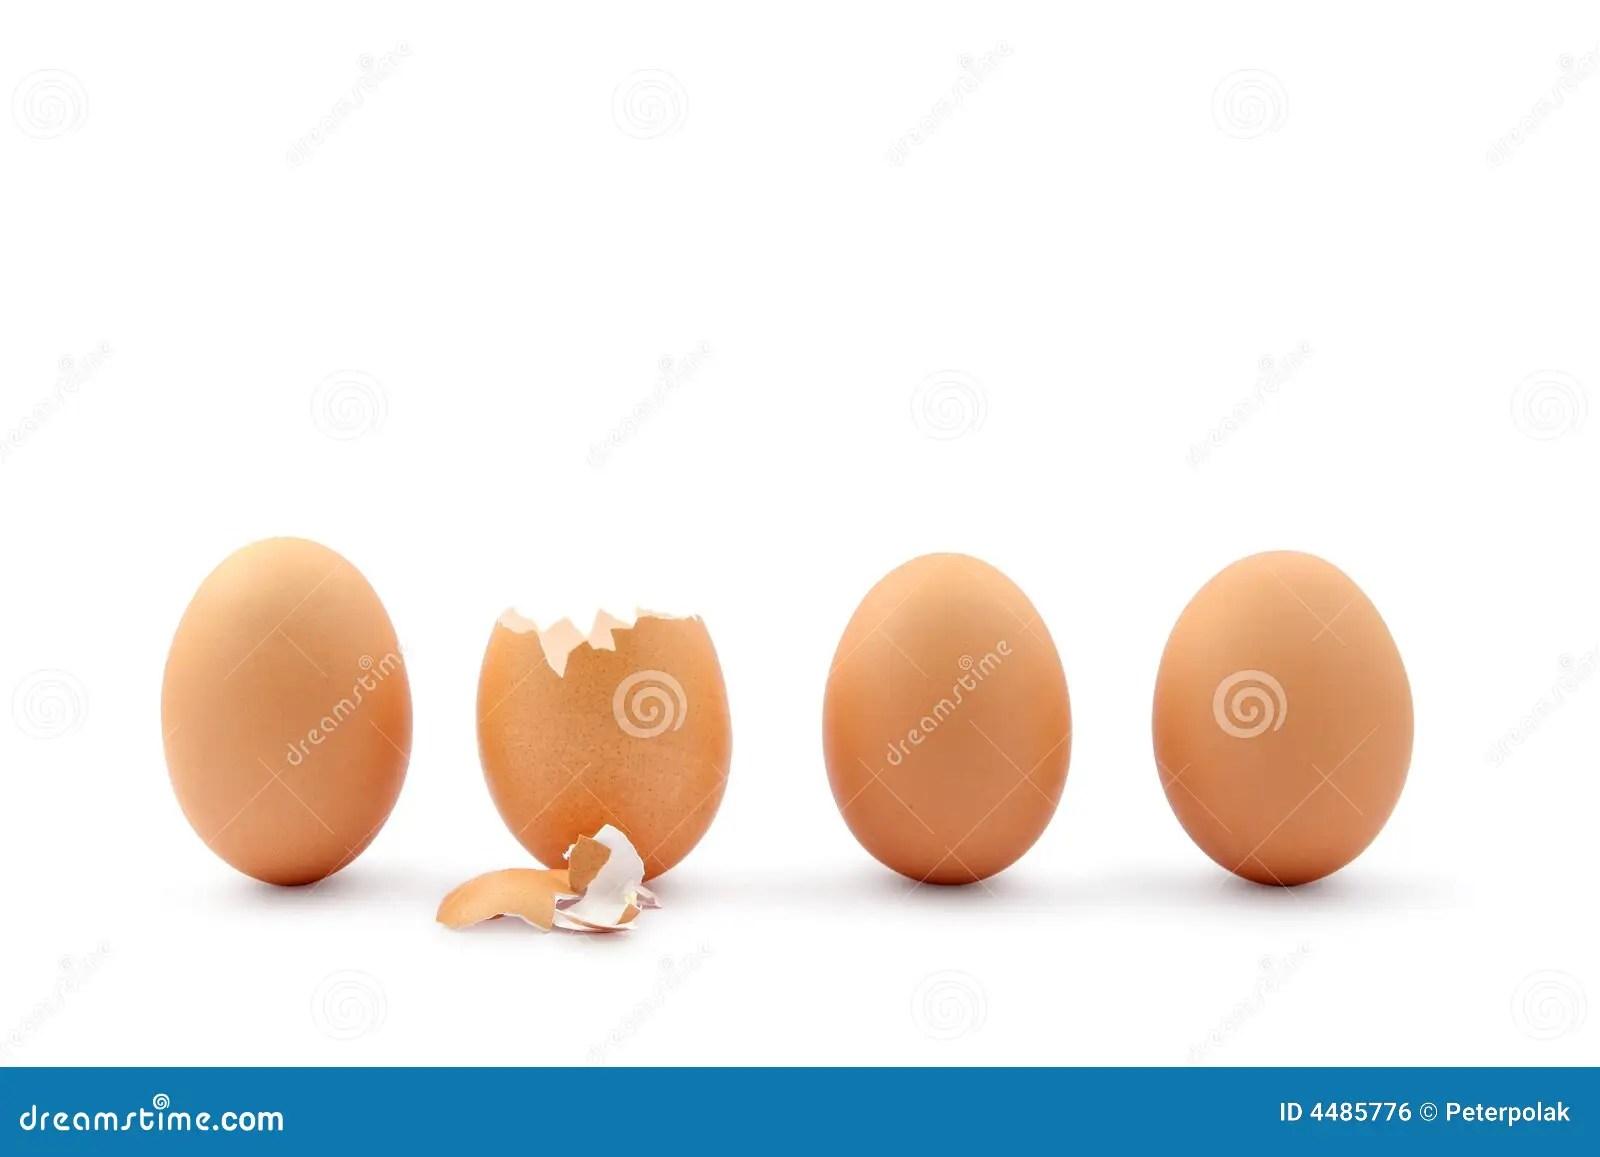 Eat Chicken Raw Eggs